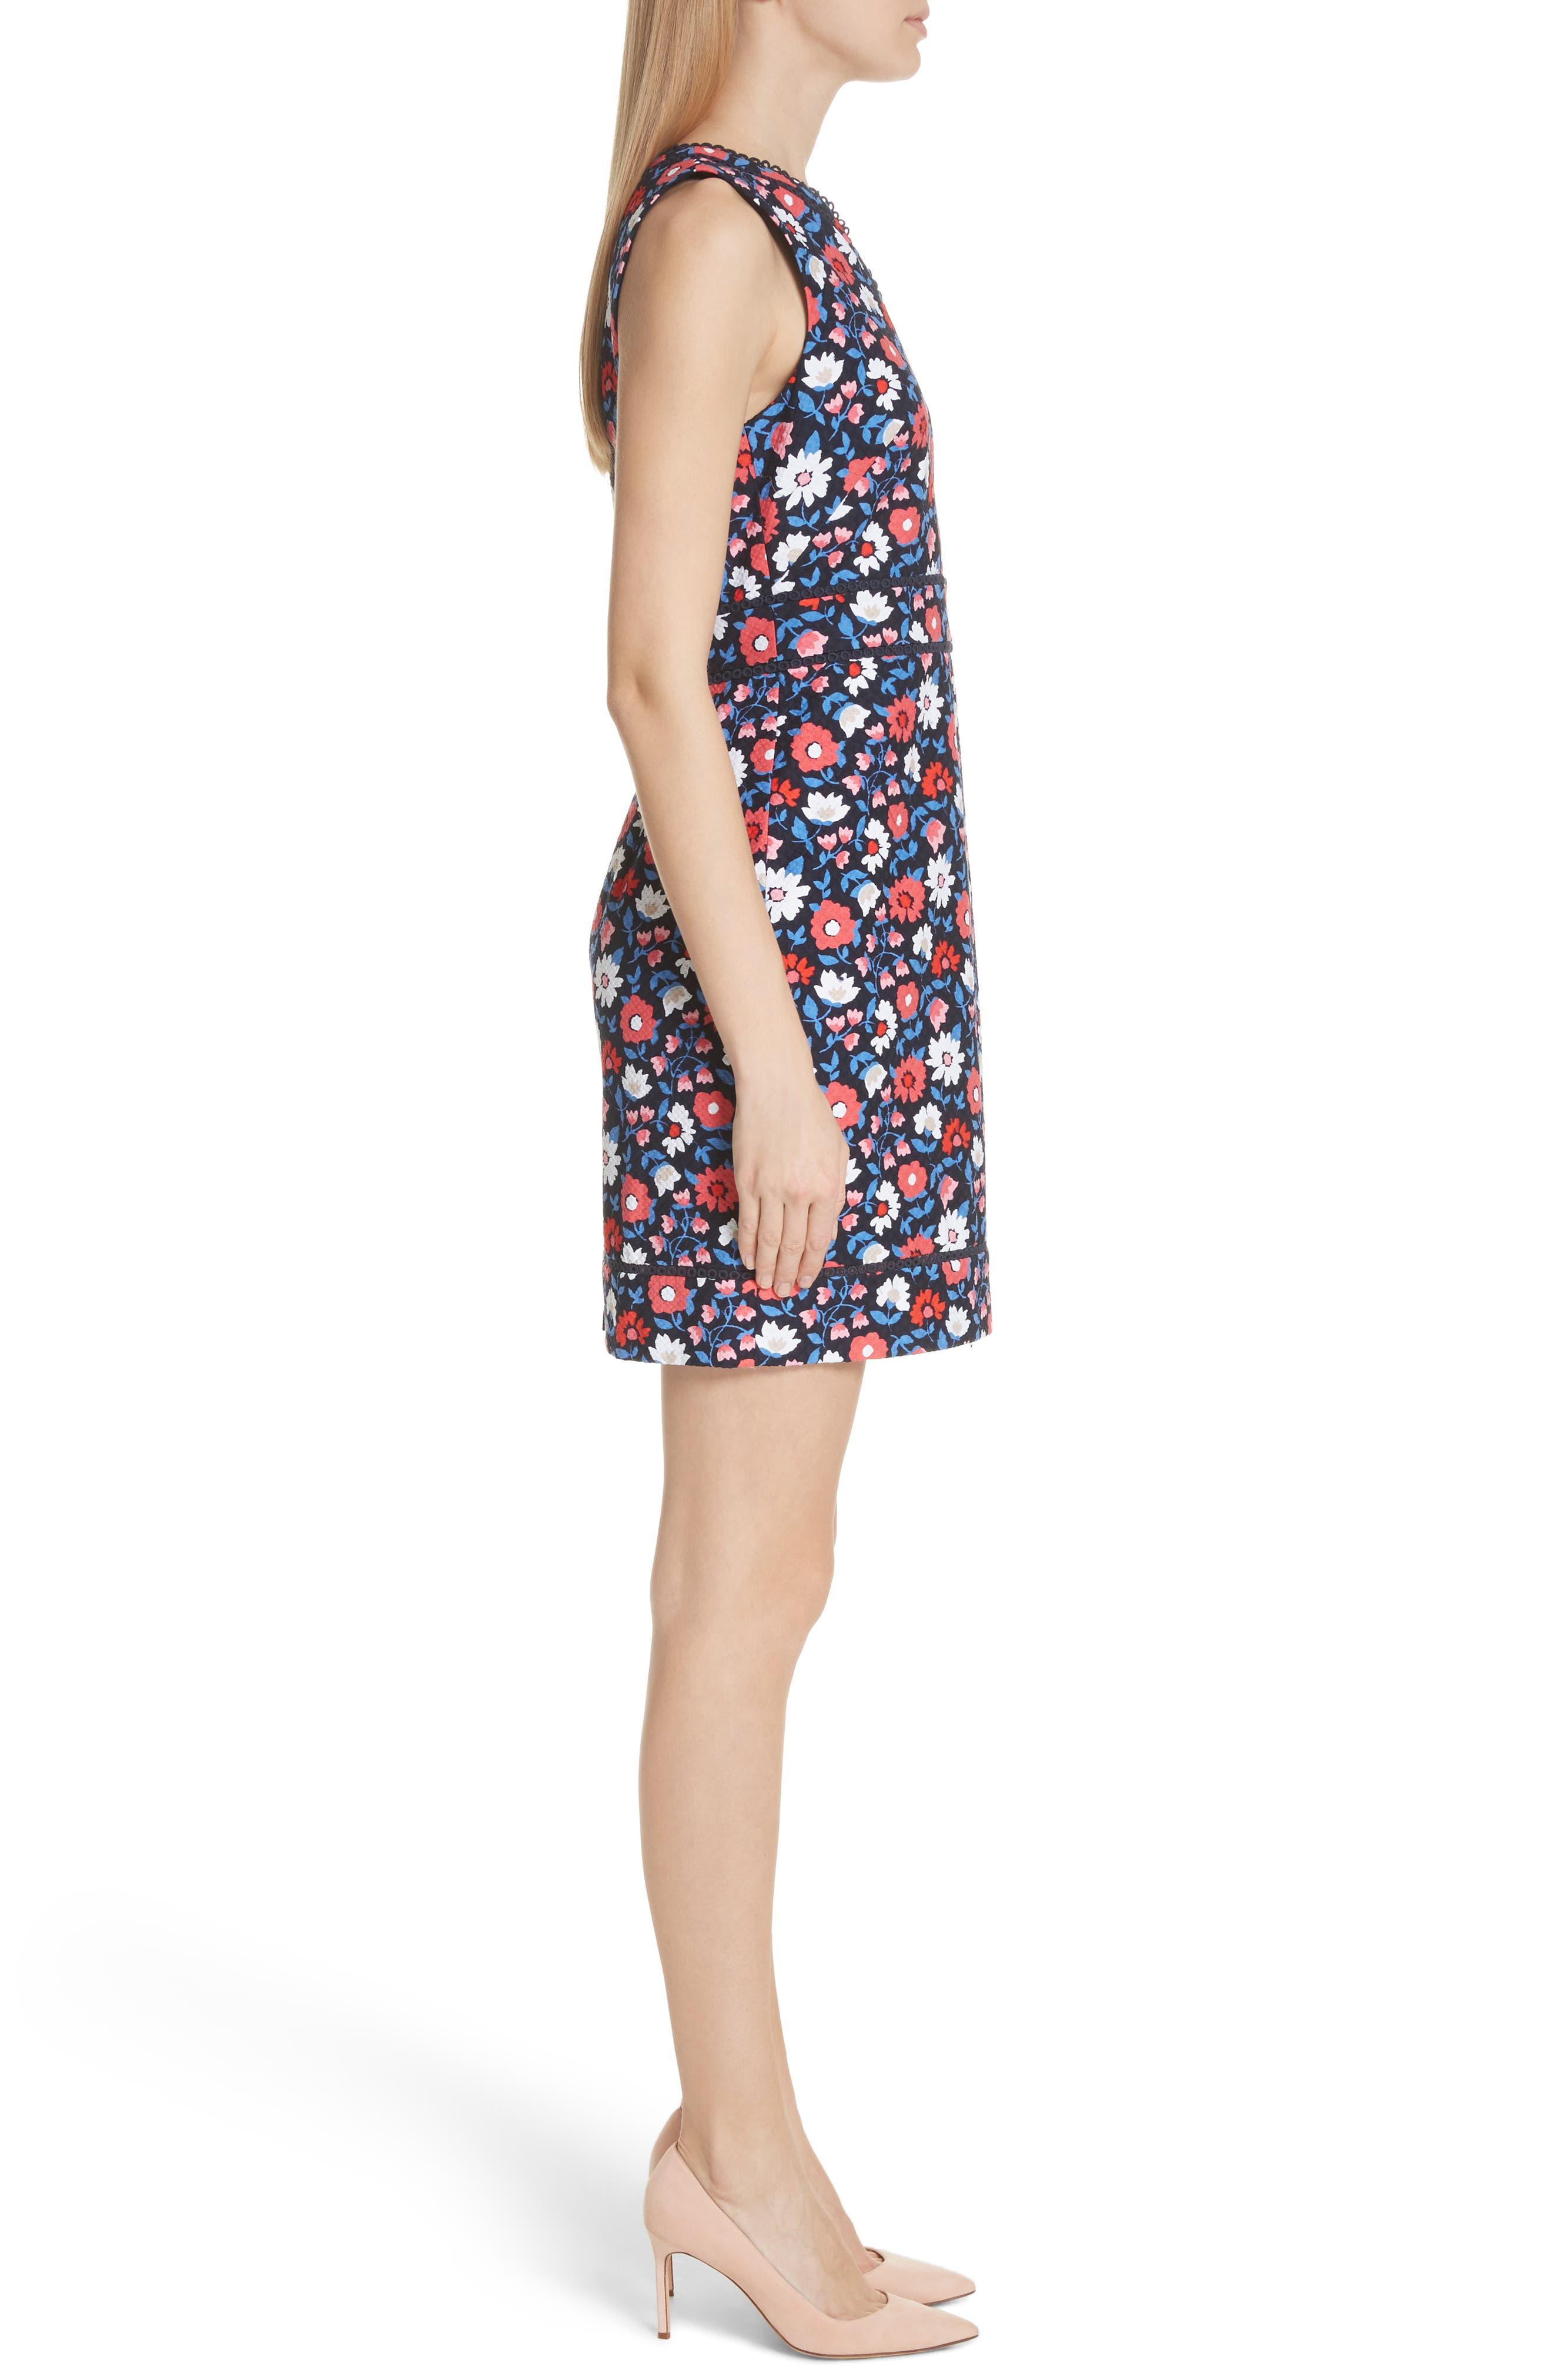 kate spade daisy jacquard sheath dress,                             Alternate thumbnail 3, color,